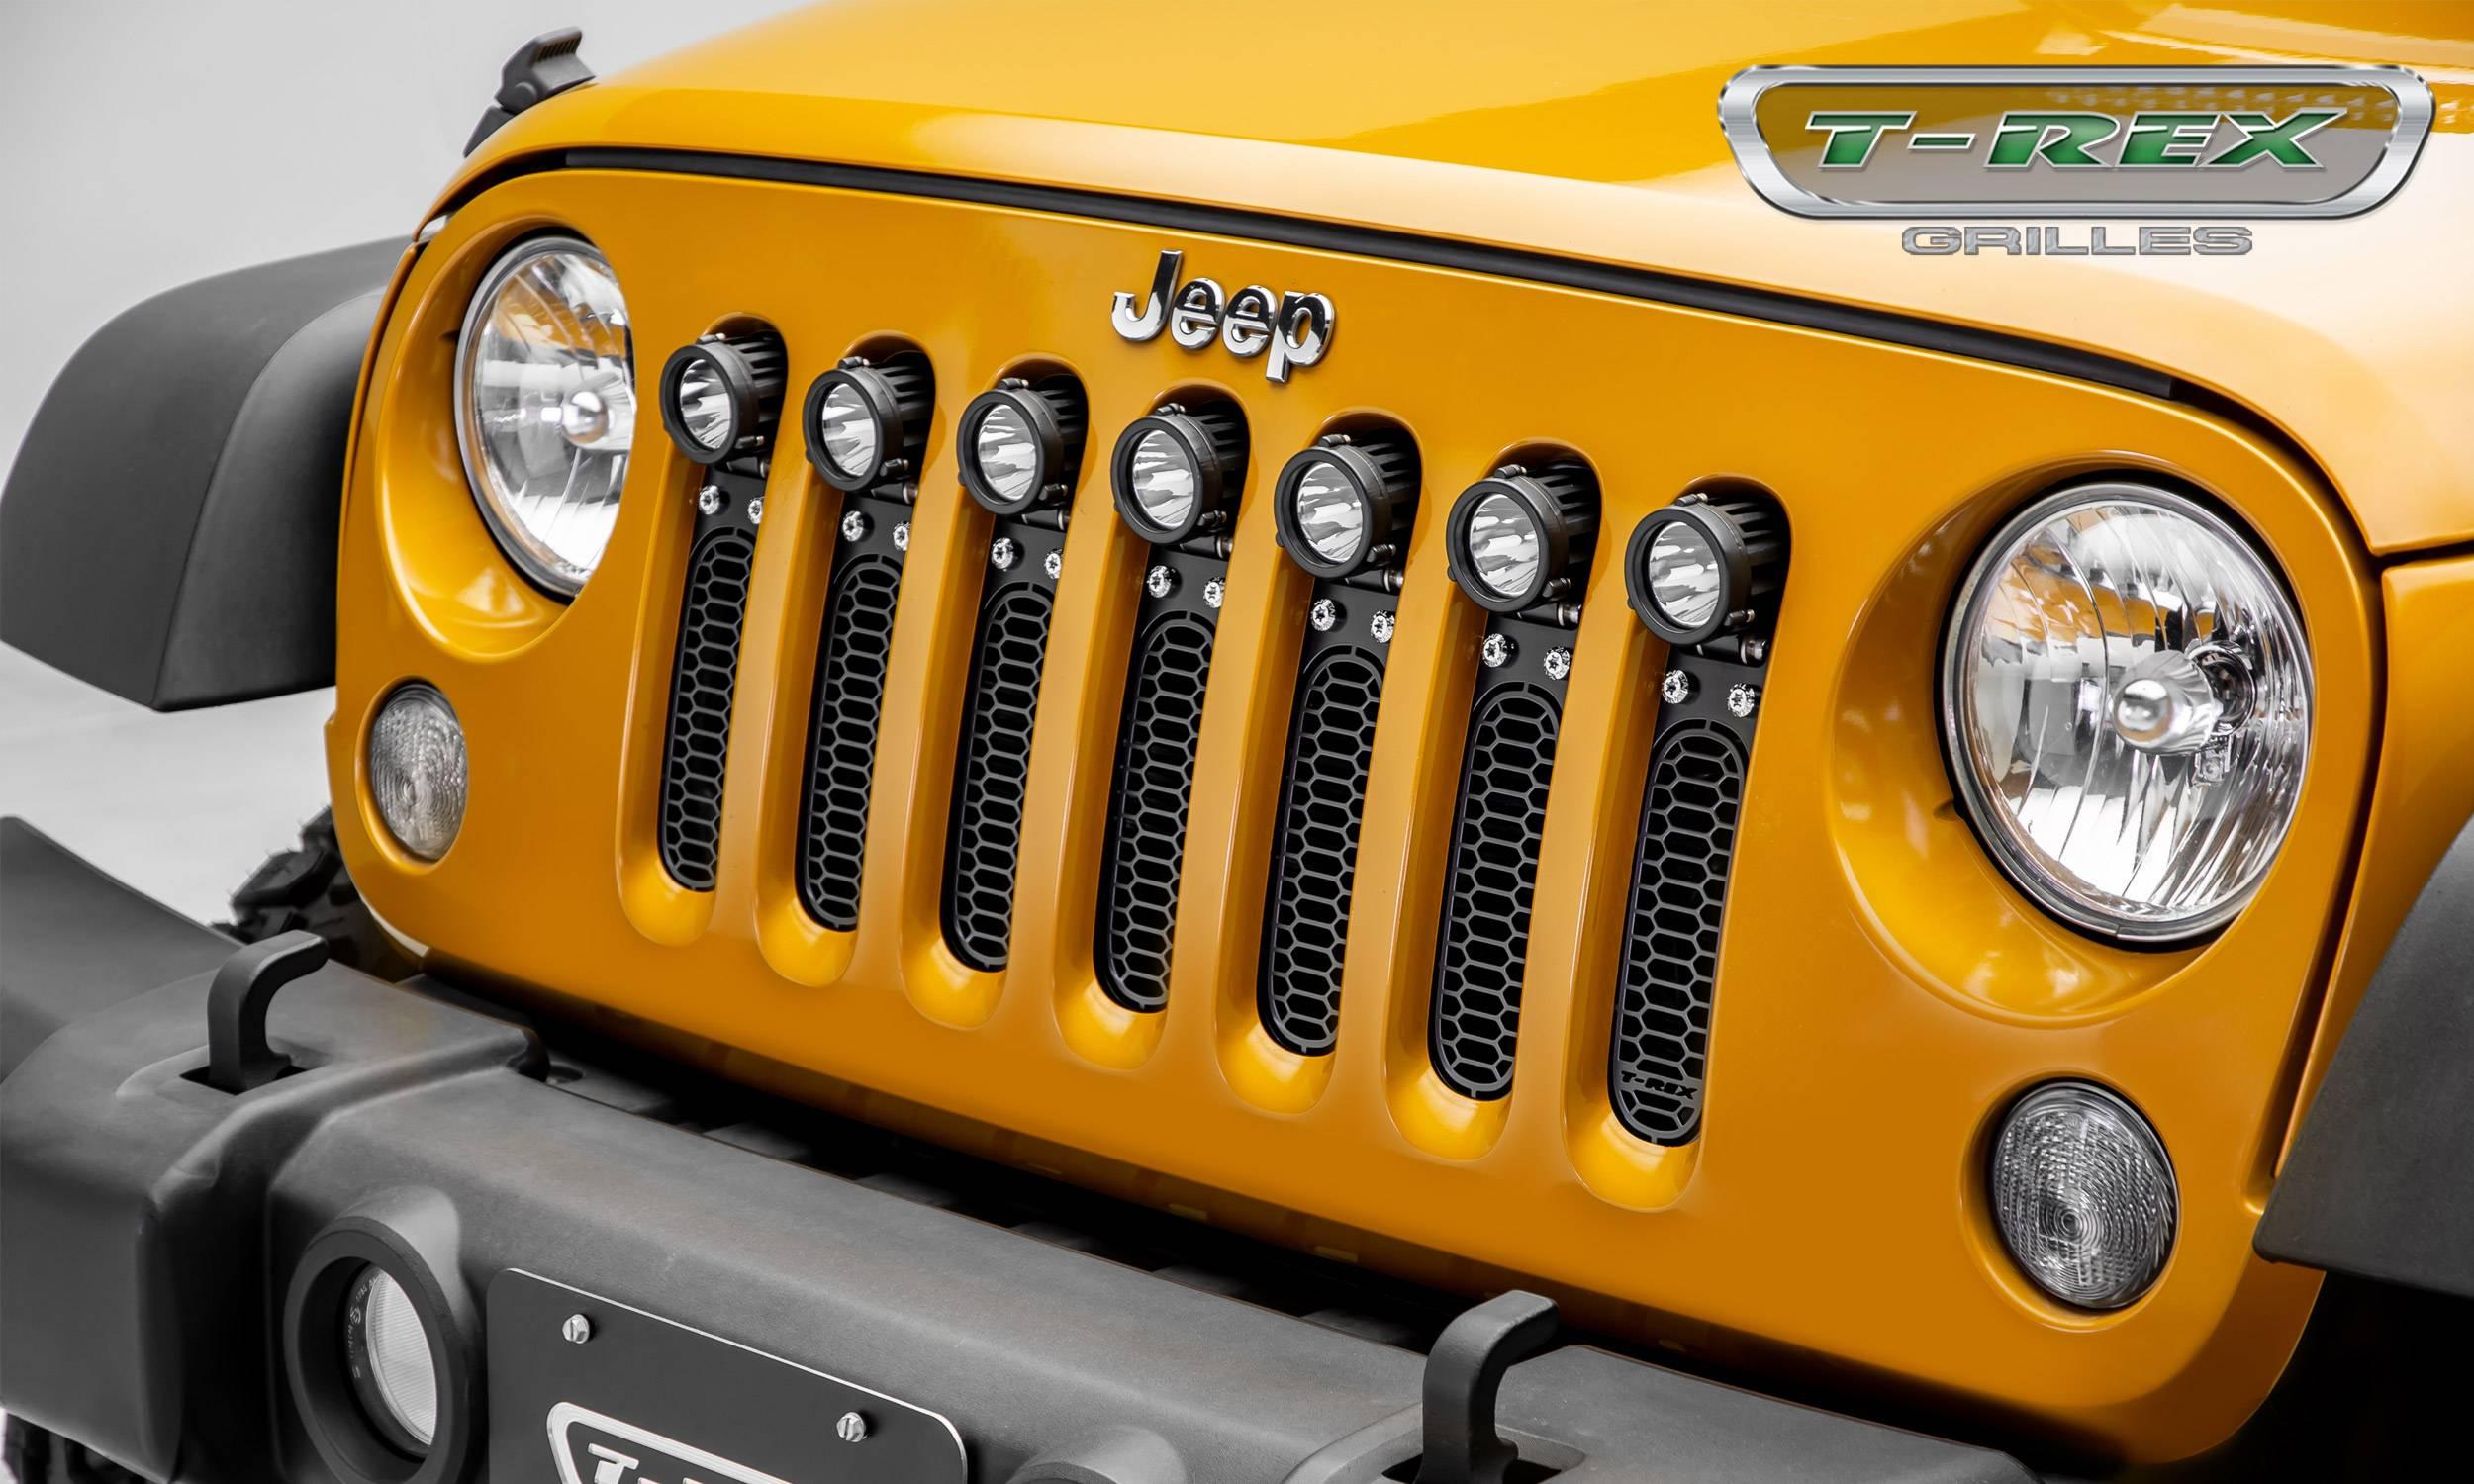 2007 2018 Jeep Wrangler Jk Laser Torch Grille Black Mild Steel 1 Pc Insert 7314841